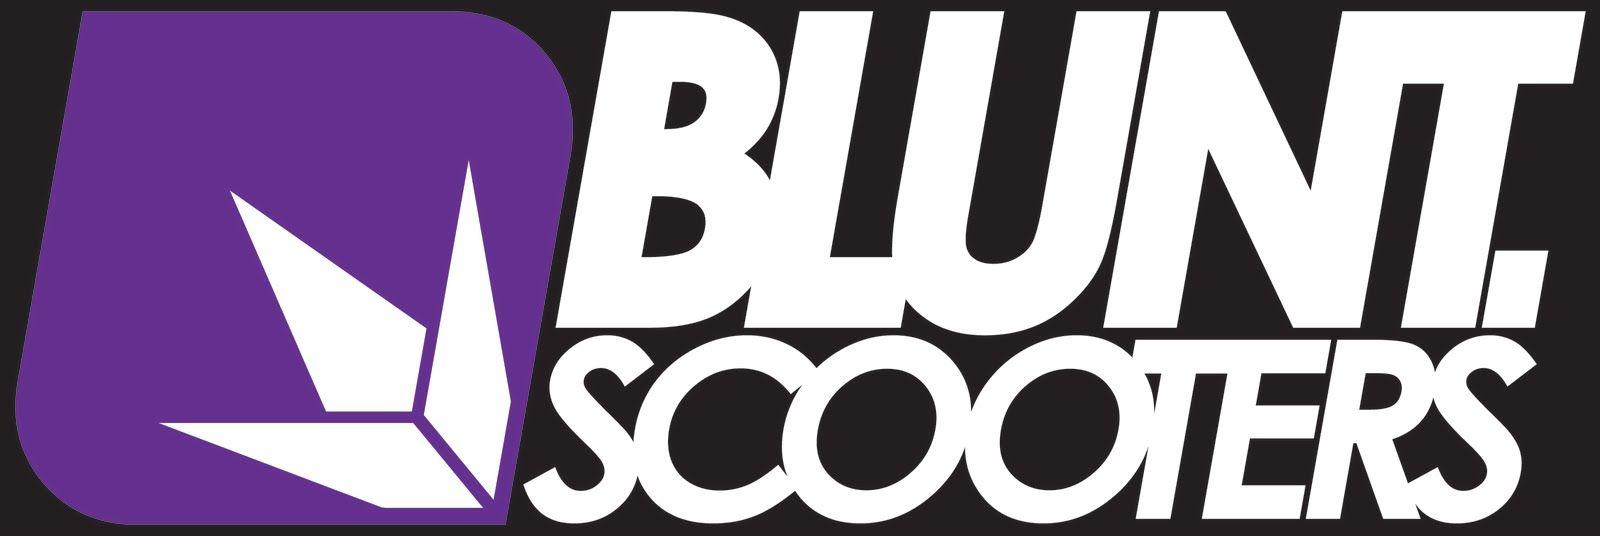 Similiar Blunt Envy Scooters Logo Keywords